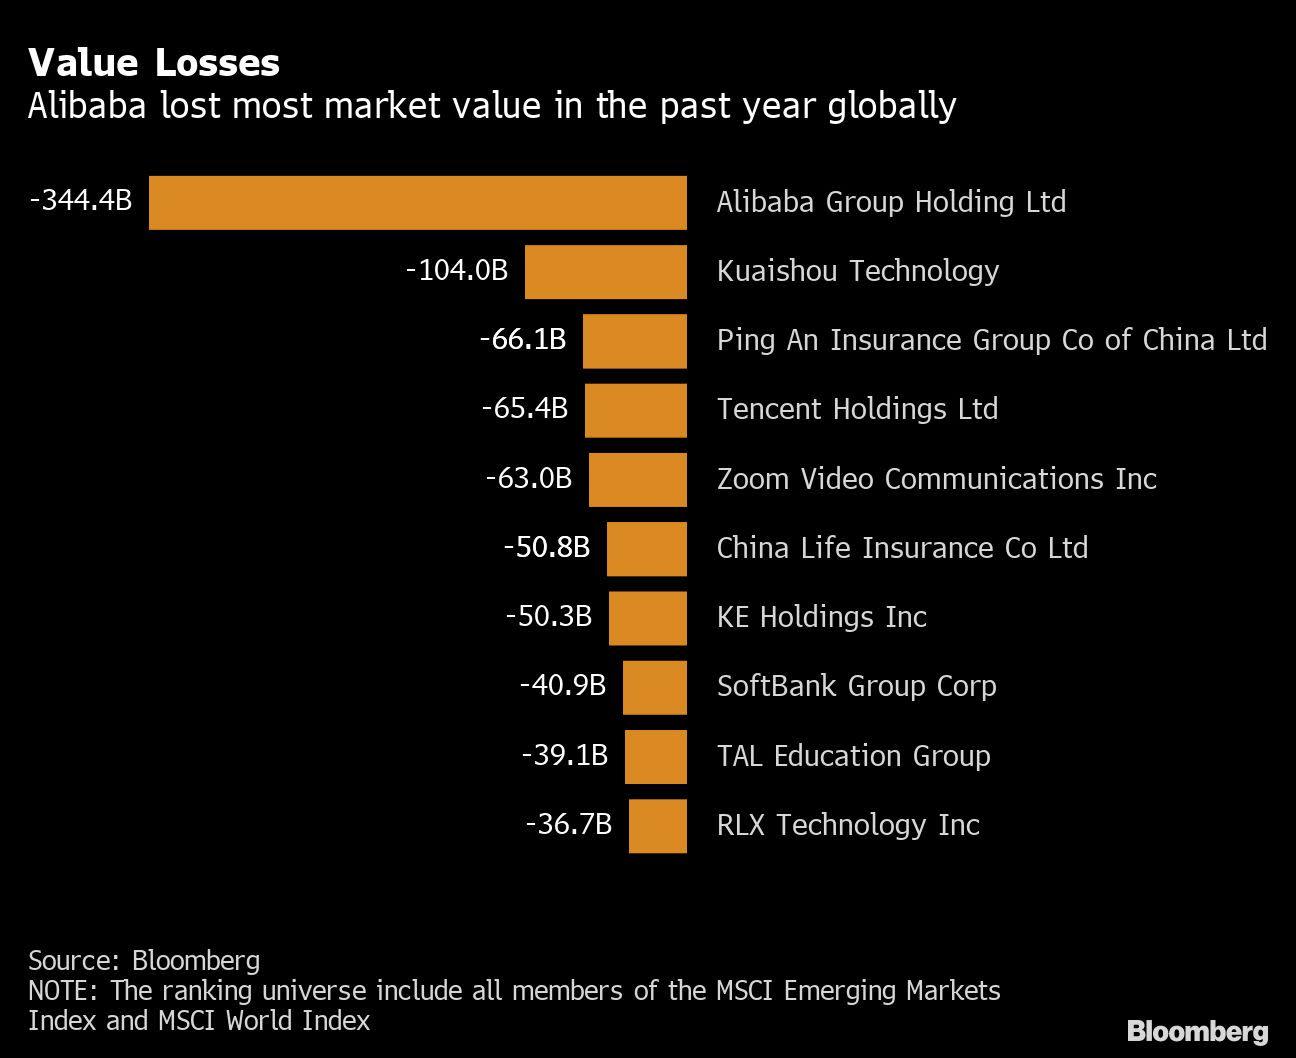 Alibaba Has Lost $344 Billion in World's Biggest Wipeout